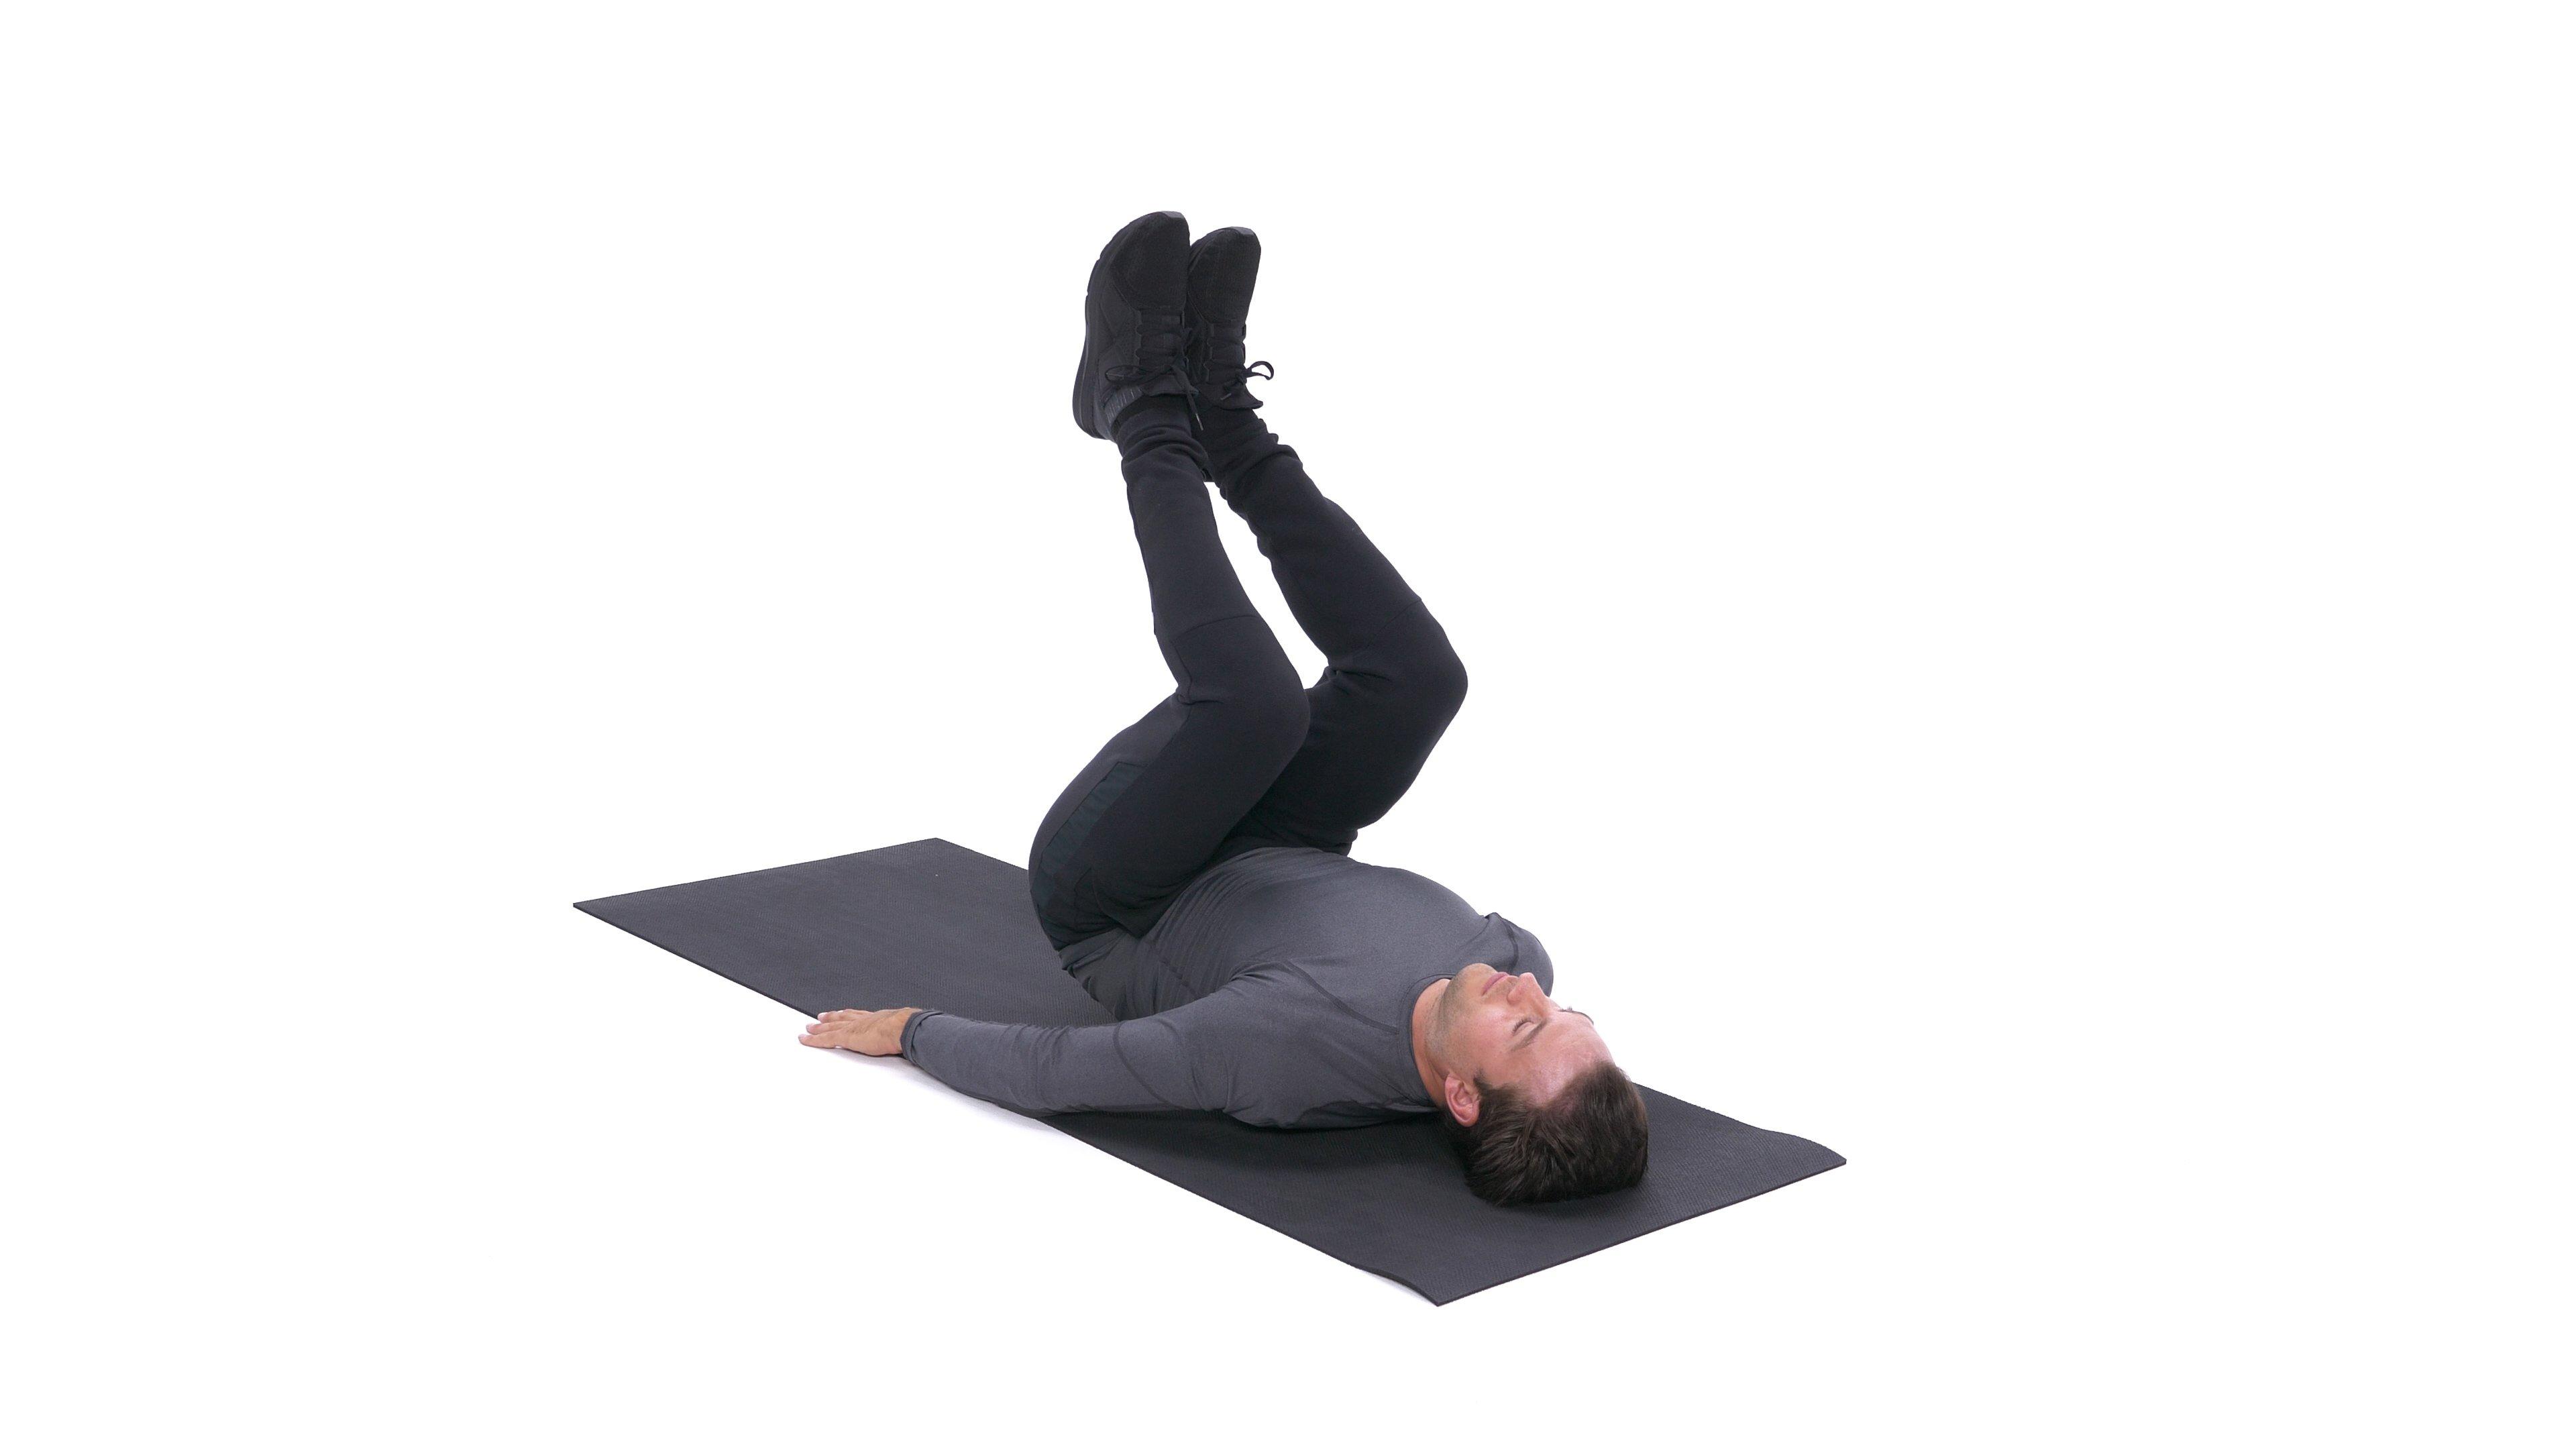 Leg Pull-In image